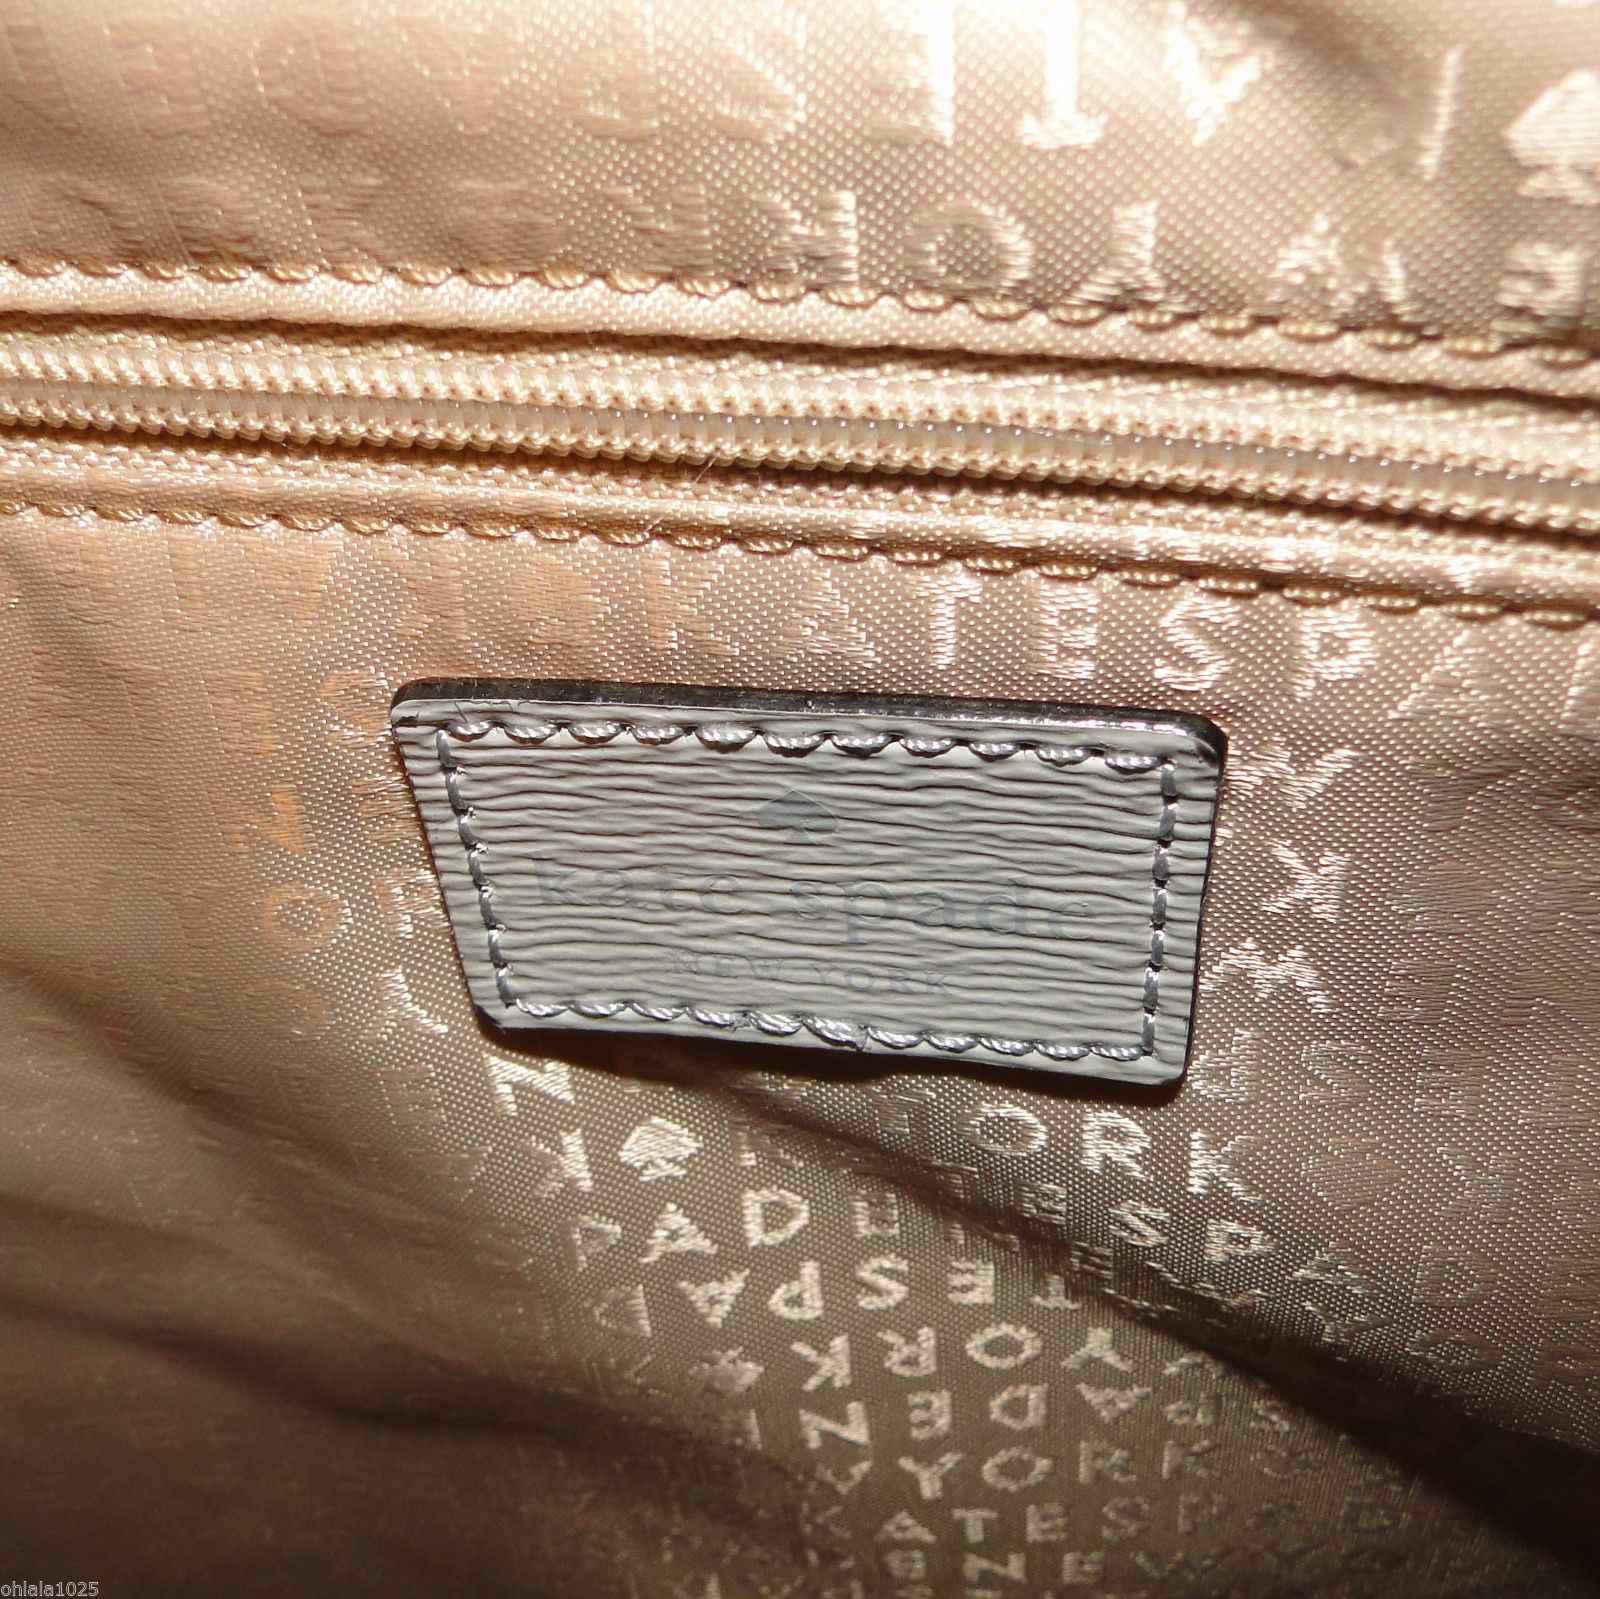 Kate Spade Beacon Court Jeanne Patent Leather Satchel Handbag